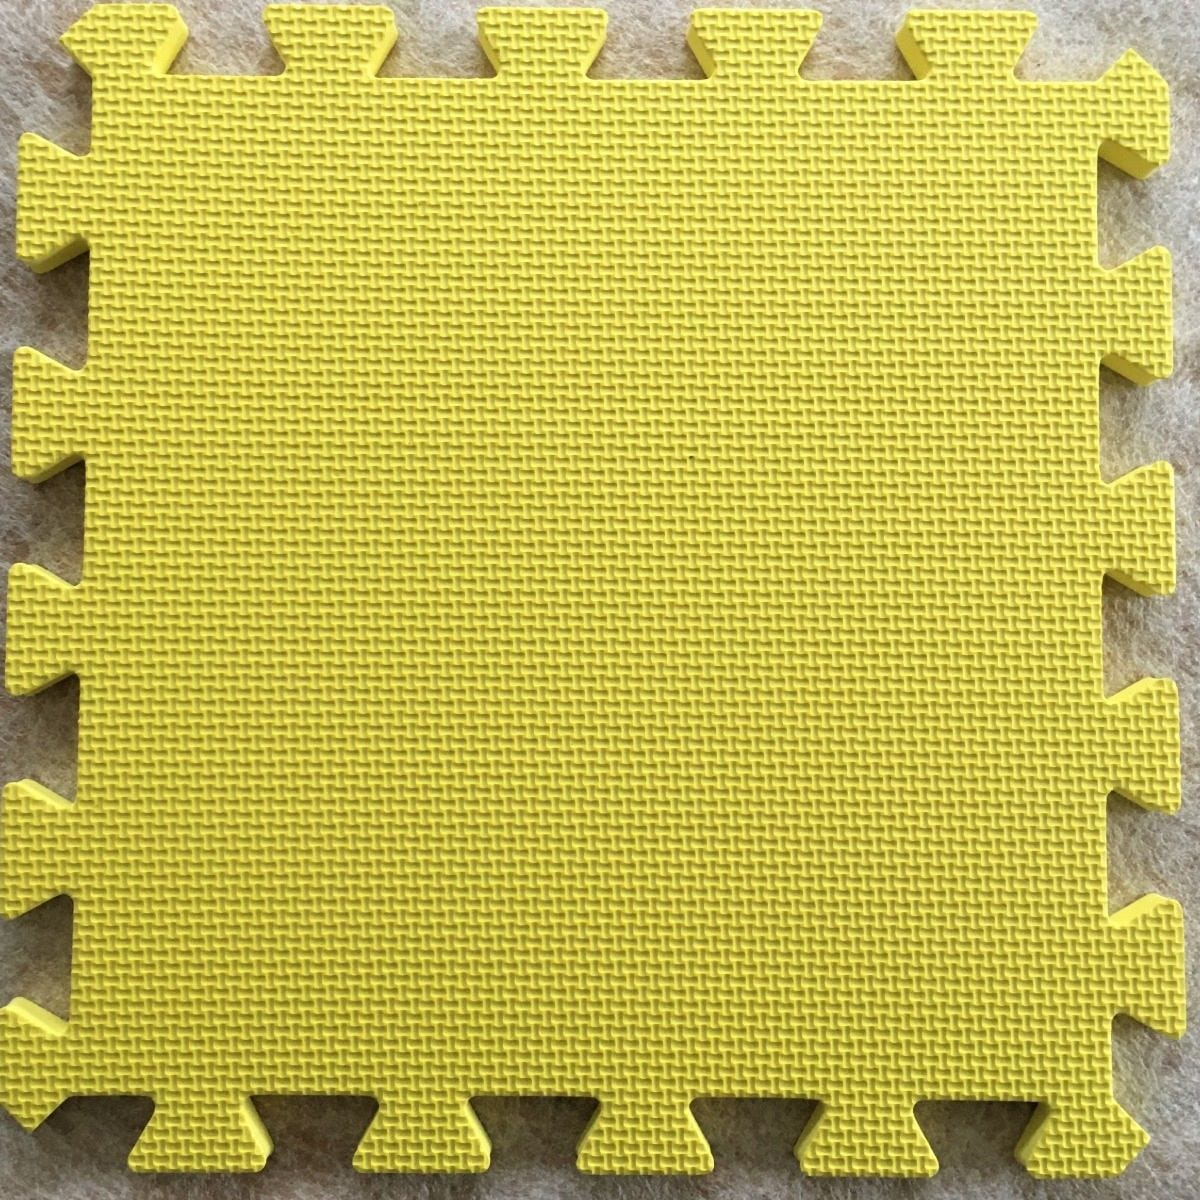 Warm Floor Playhouse Tiling Kit - Yellow